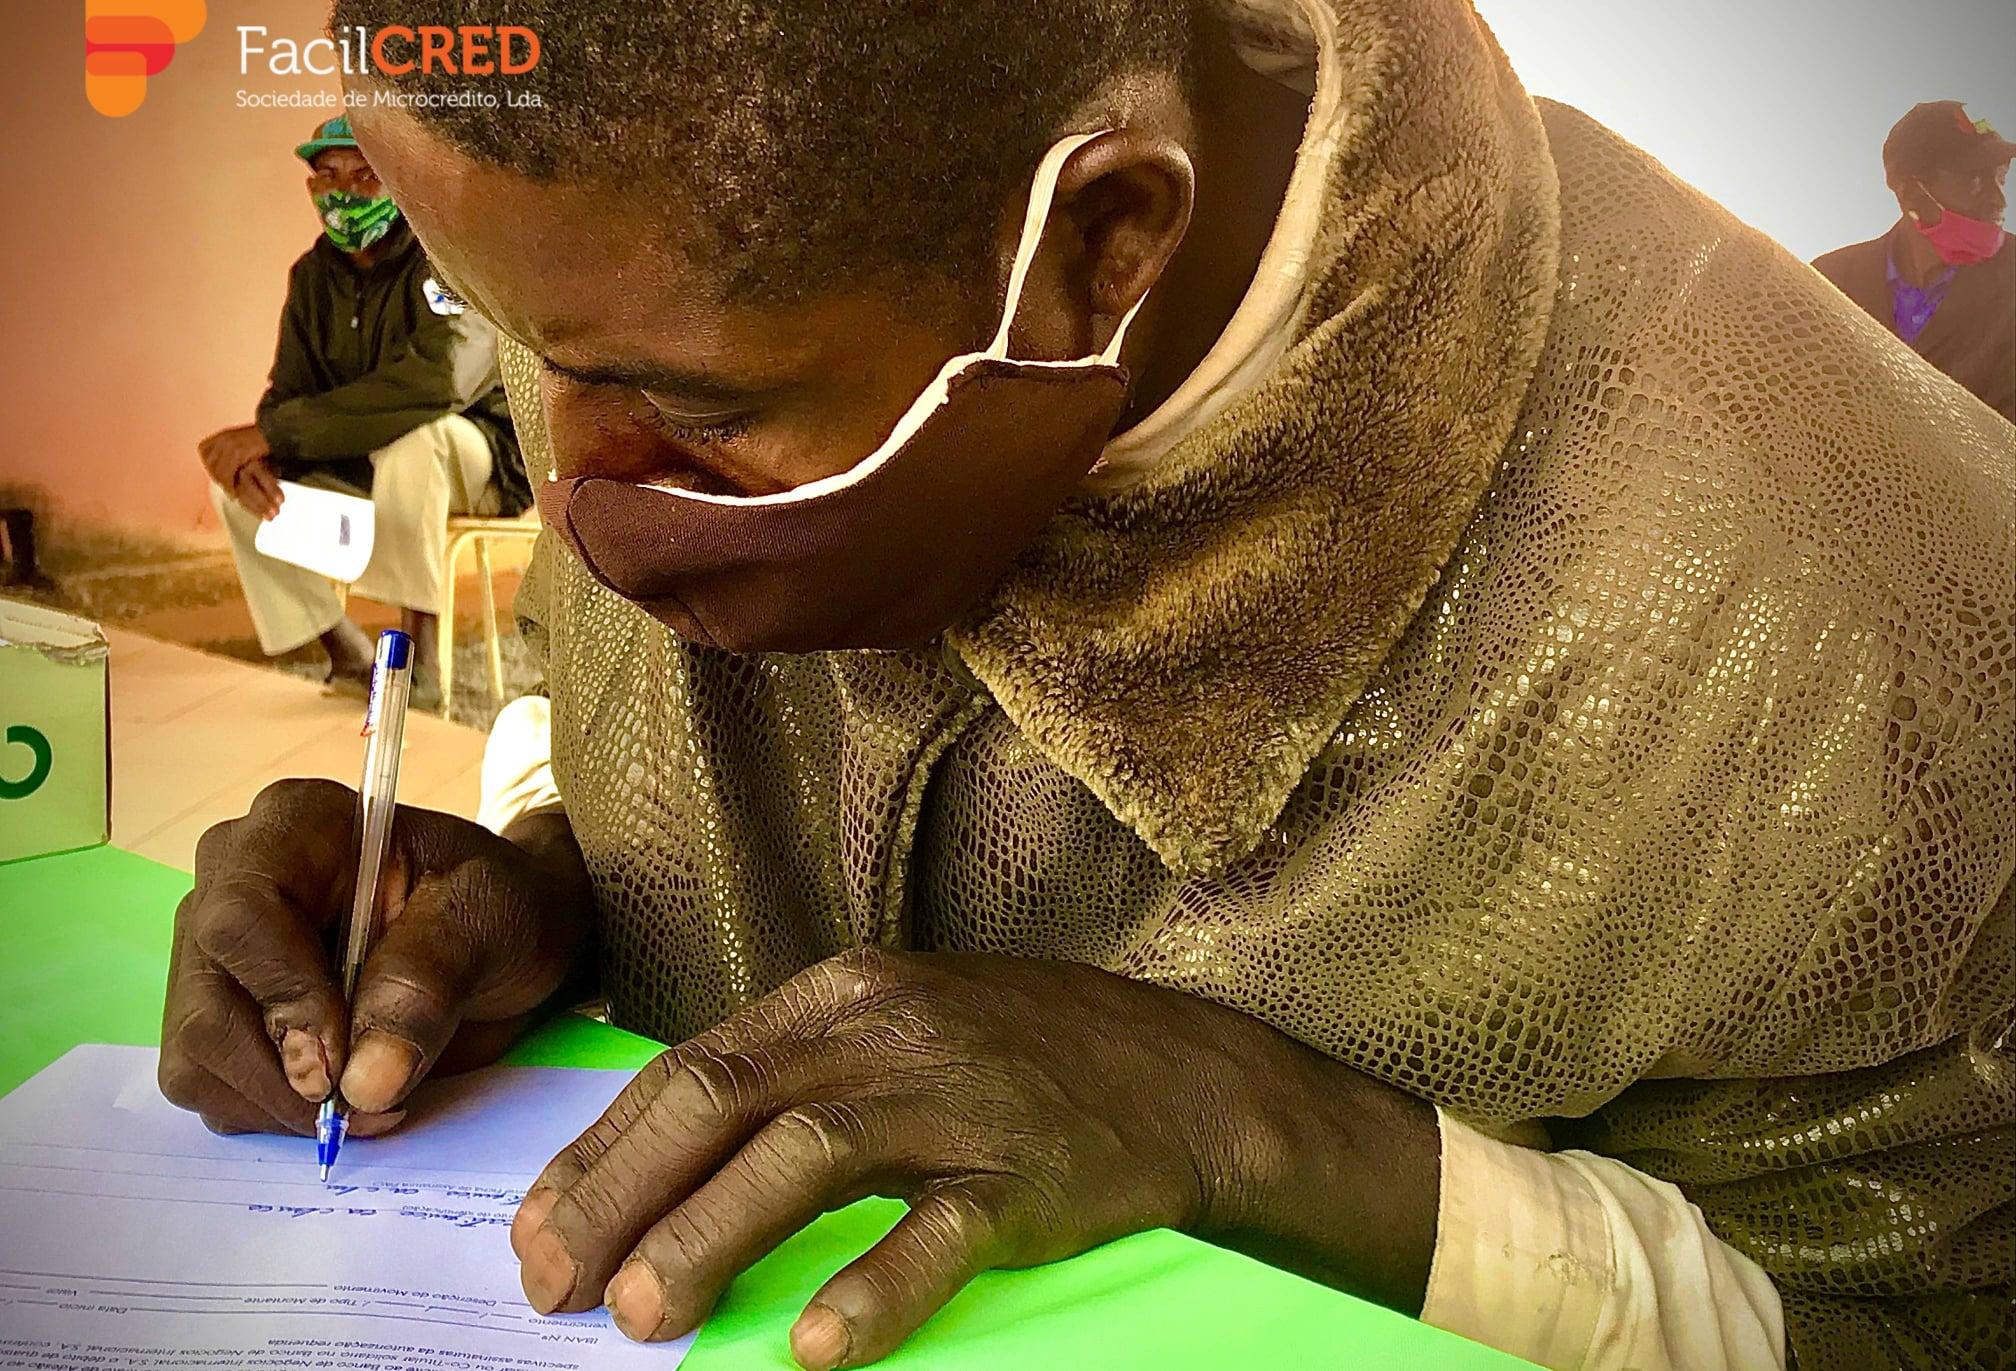 Facilcred financia actividade agrícola com 329 milhões de kwanzas